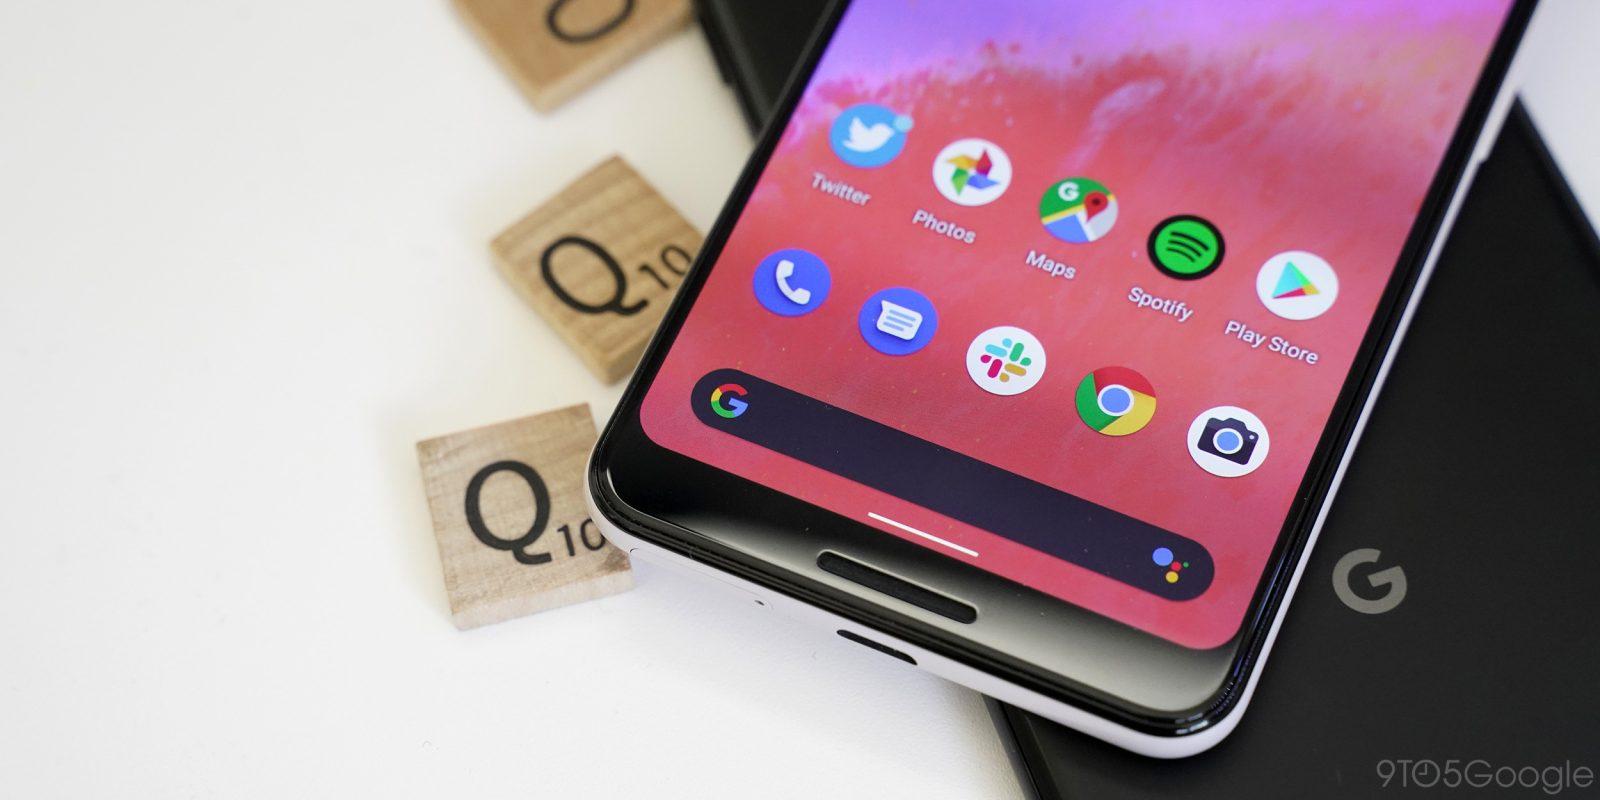 Google releases Android Q Beta 5 with gestural nav tweaks - 9to5Google